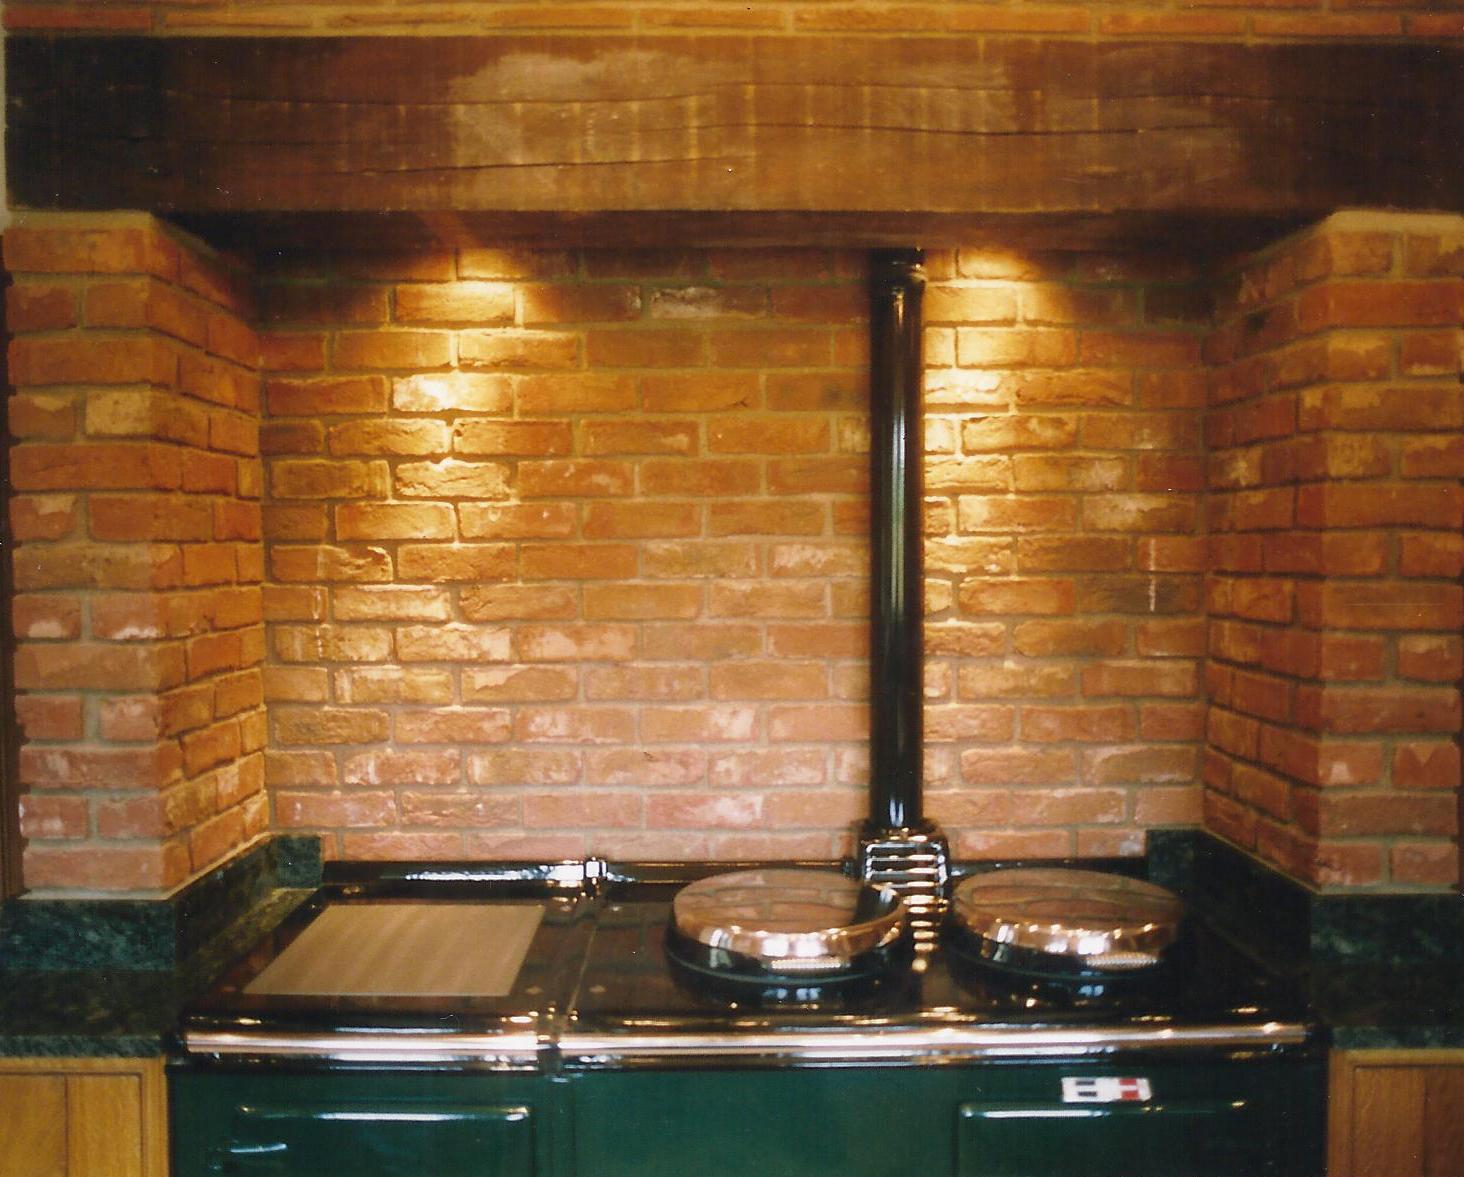 Kitchen Image 2 - North End Farm - East Yorkshire Architects - Samuel Kendall Associates